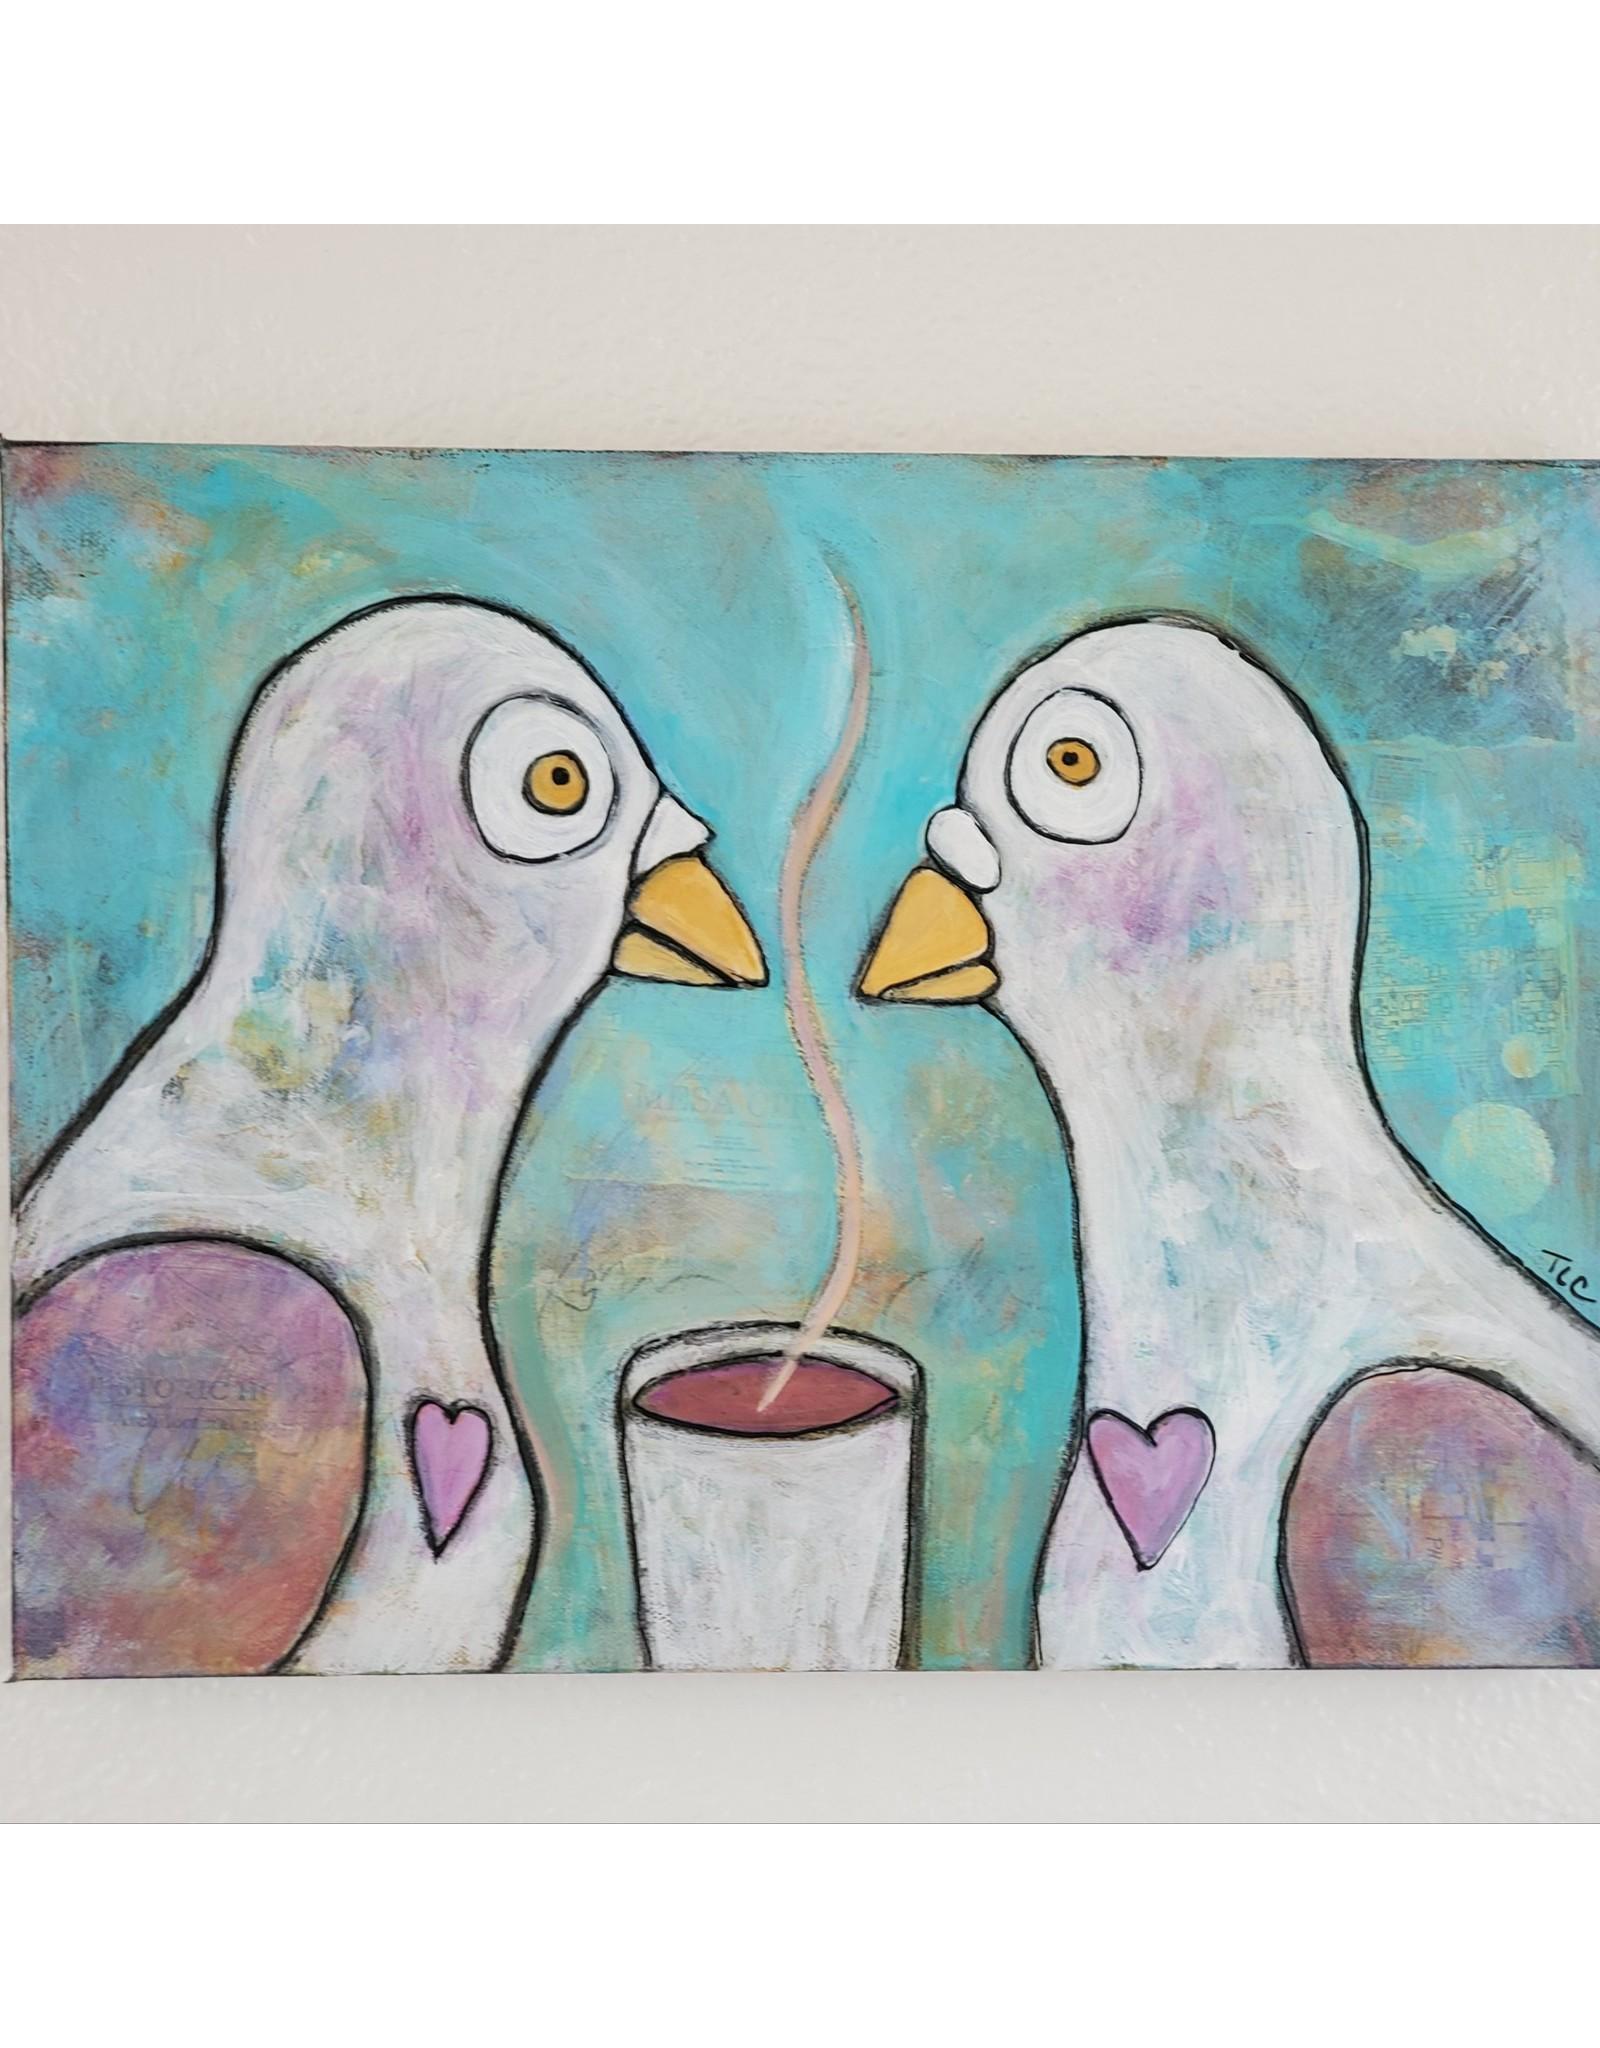 Inspire Farms Original Art Meet Me in Mesa - Tiffiny Liley